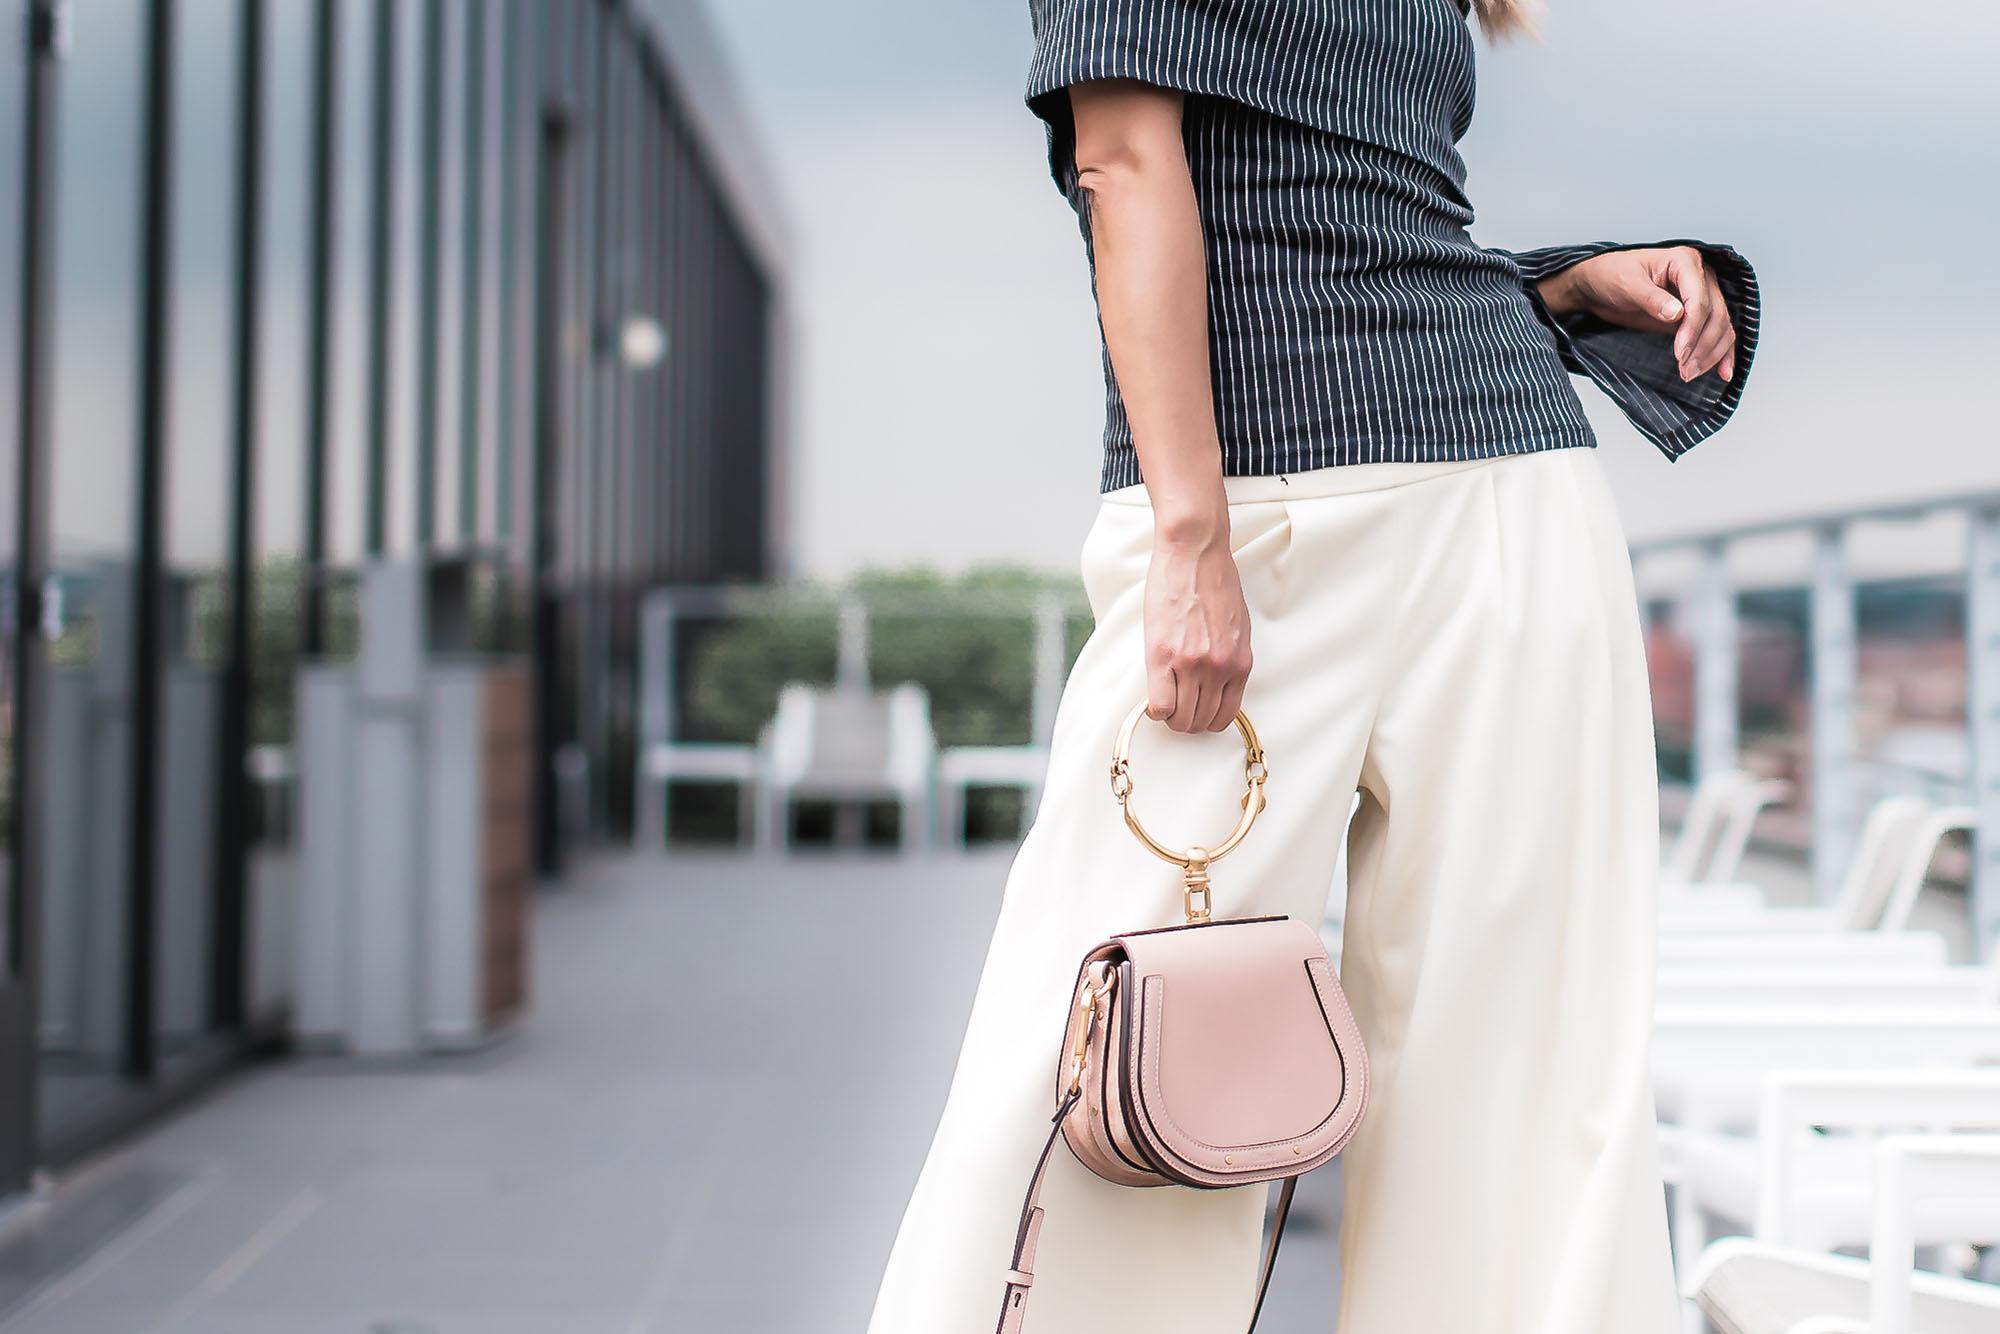 Anchyi Adorned fashion blogger in Beaufille off shoulder top, Chanel white wide leg pants, and Chloe Nile bracelet bag